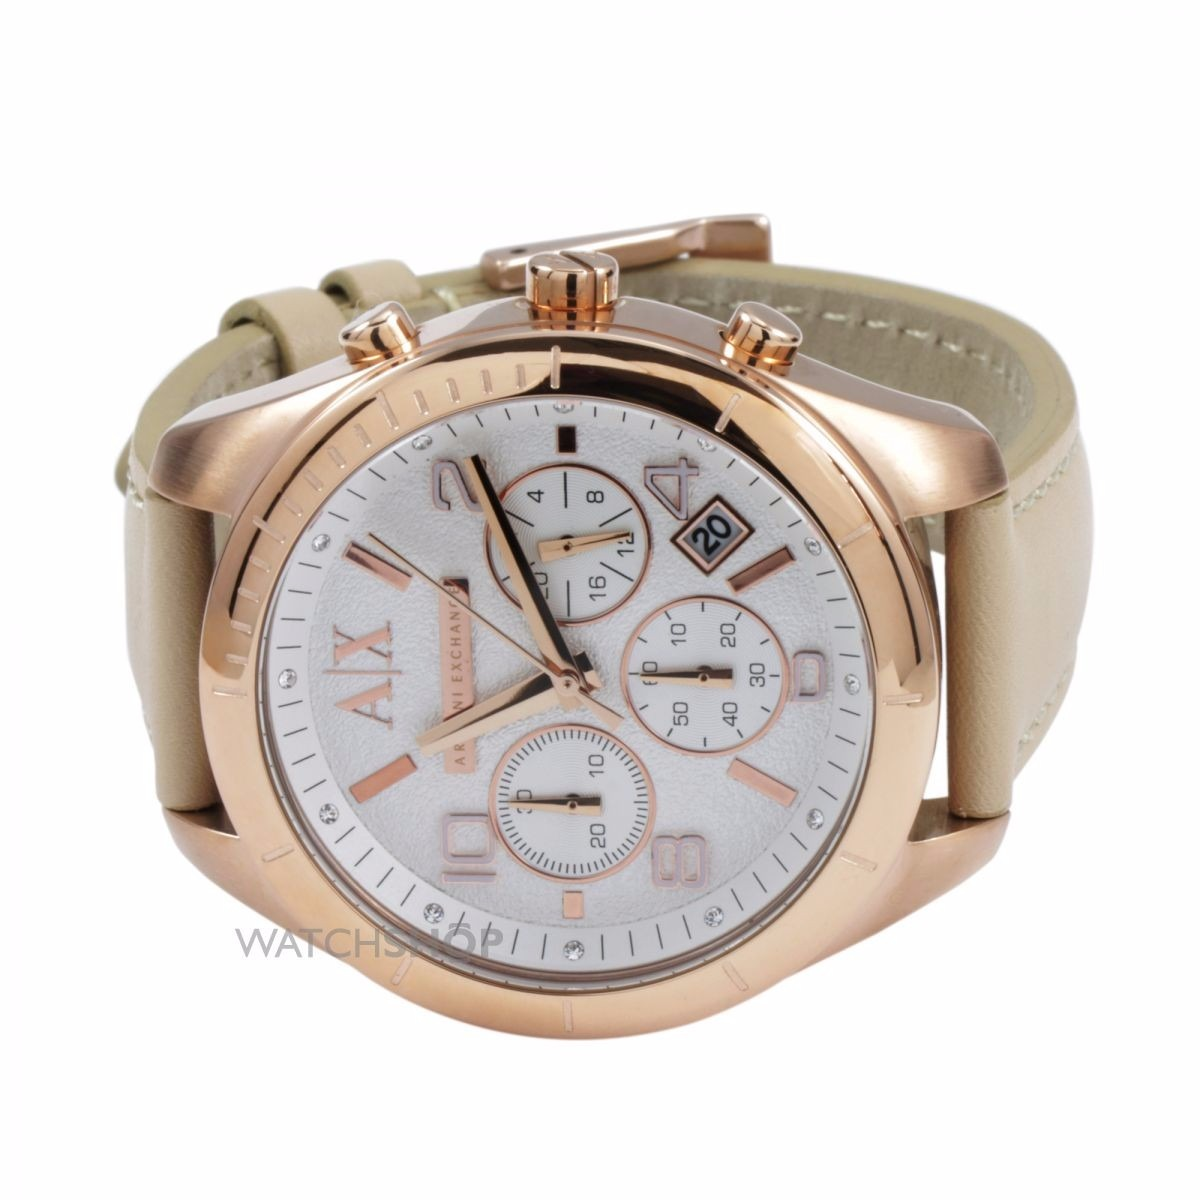 5aeac1047f4 relógio feminino armani exchange ax5504 sarena chronograph j. Carregando  zoom.